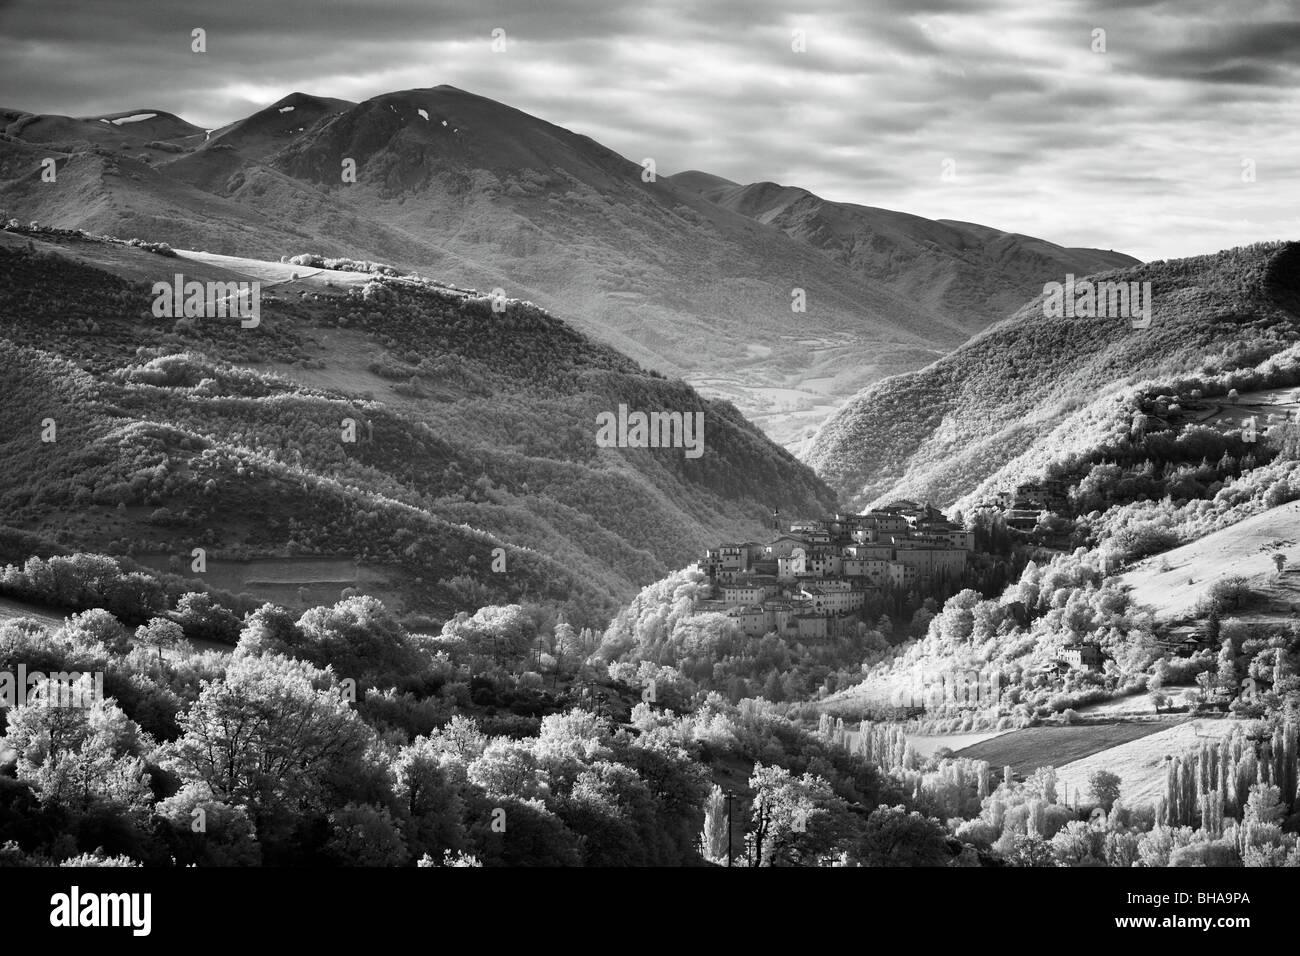 Preci, Valnerina, Monti Sibillini National Park, Umbria, Italy - Stock Image